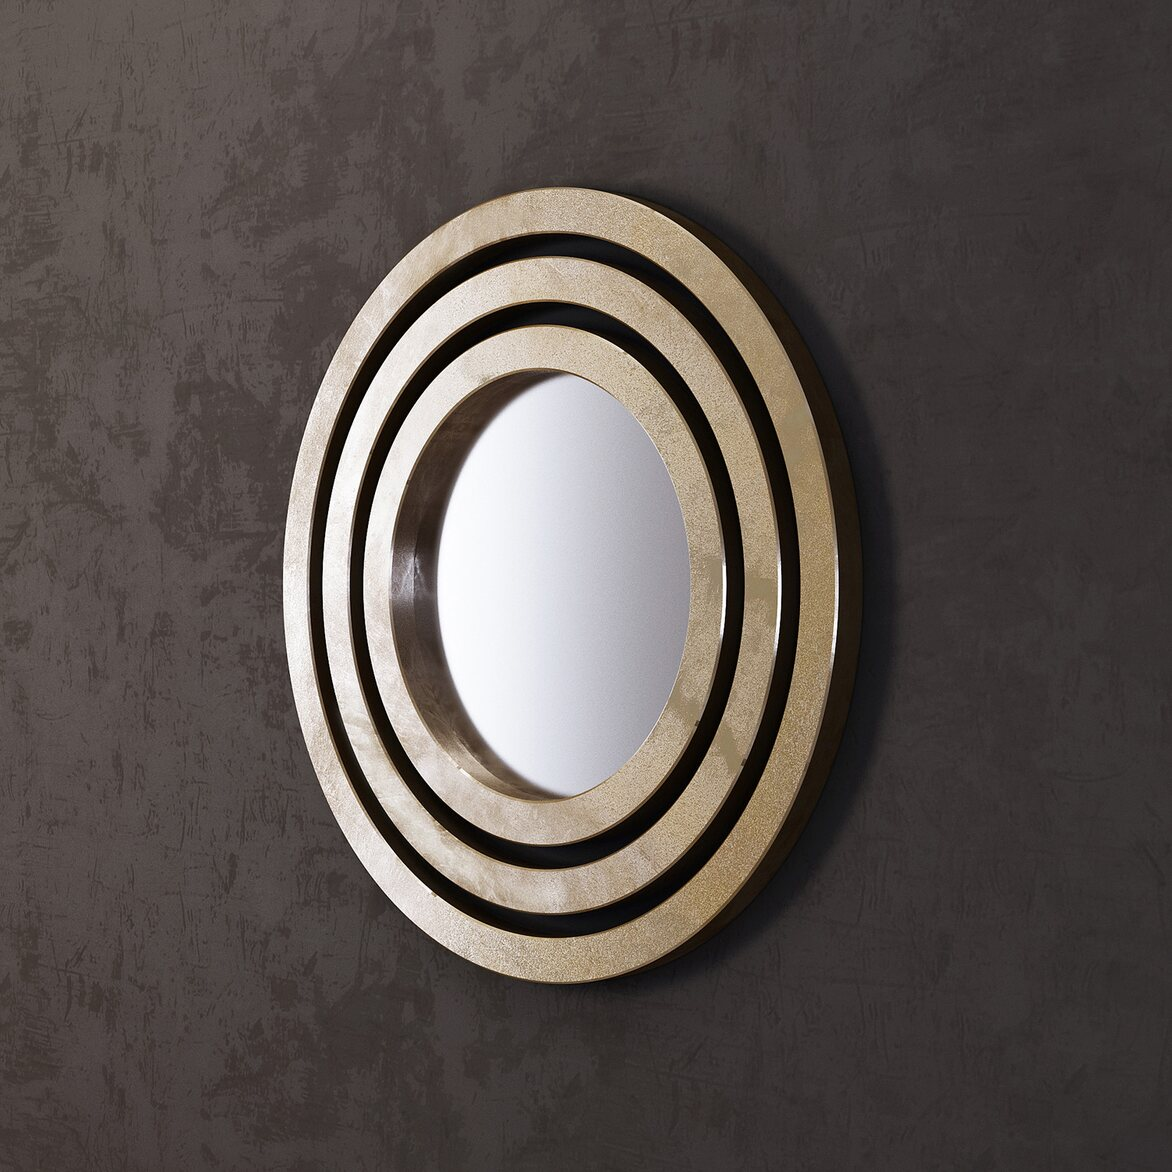 Зеркало Orion, gold 2   Настенные зеркала Kingsby